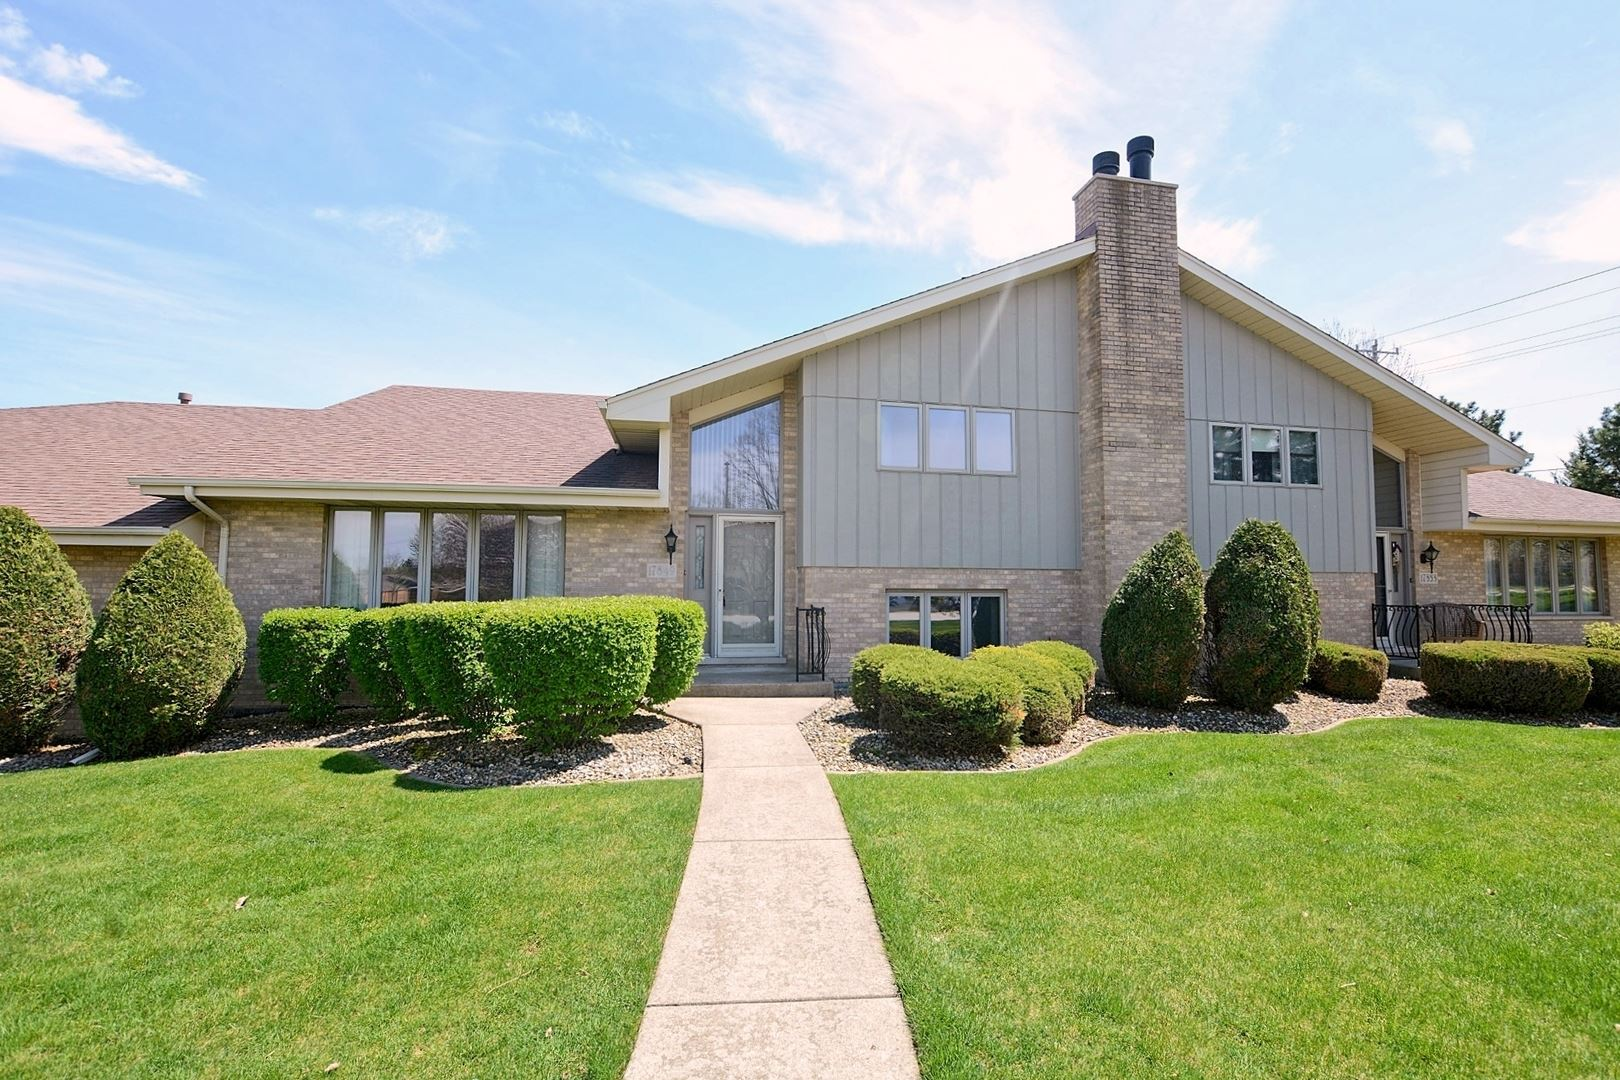 17849 BERNARD Drive, Orland Park, IL 60467 - #: 10704459